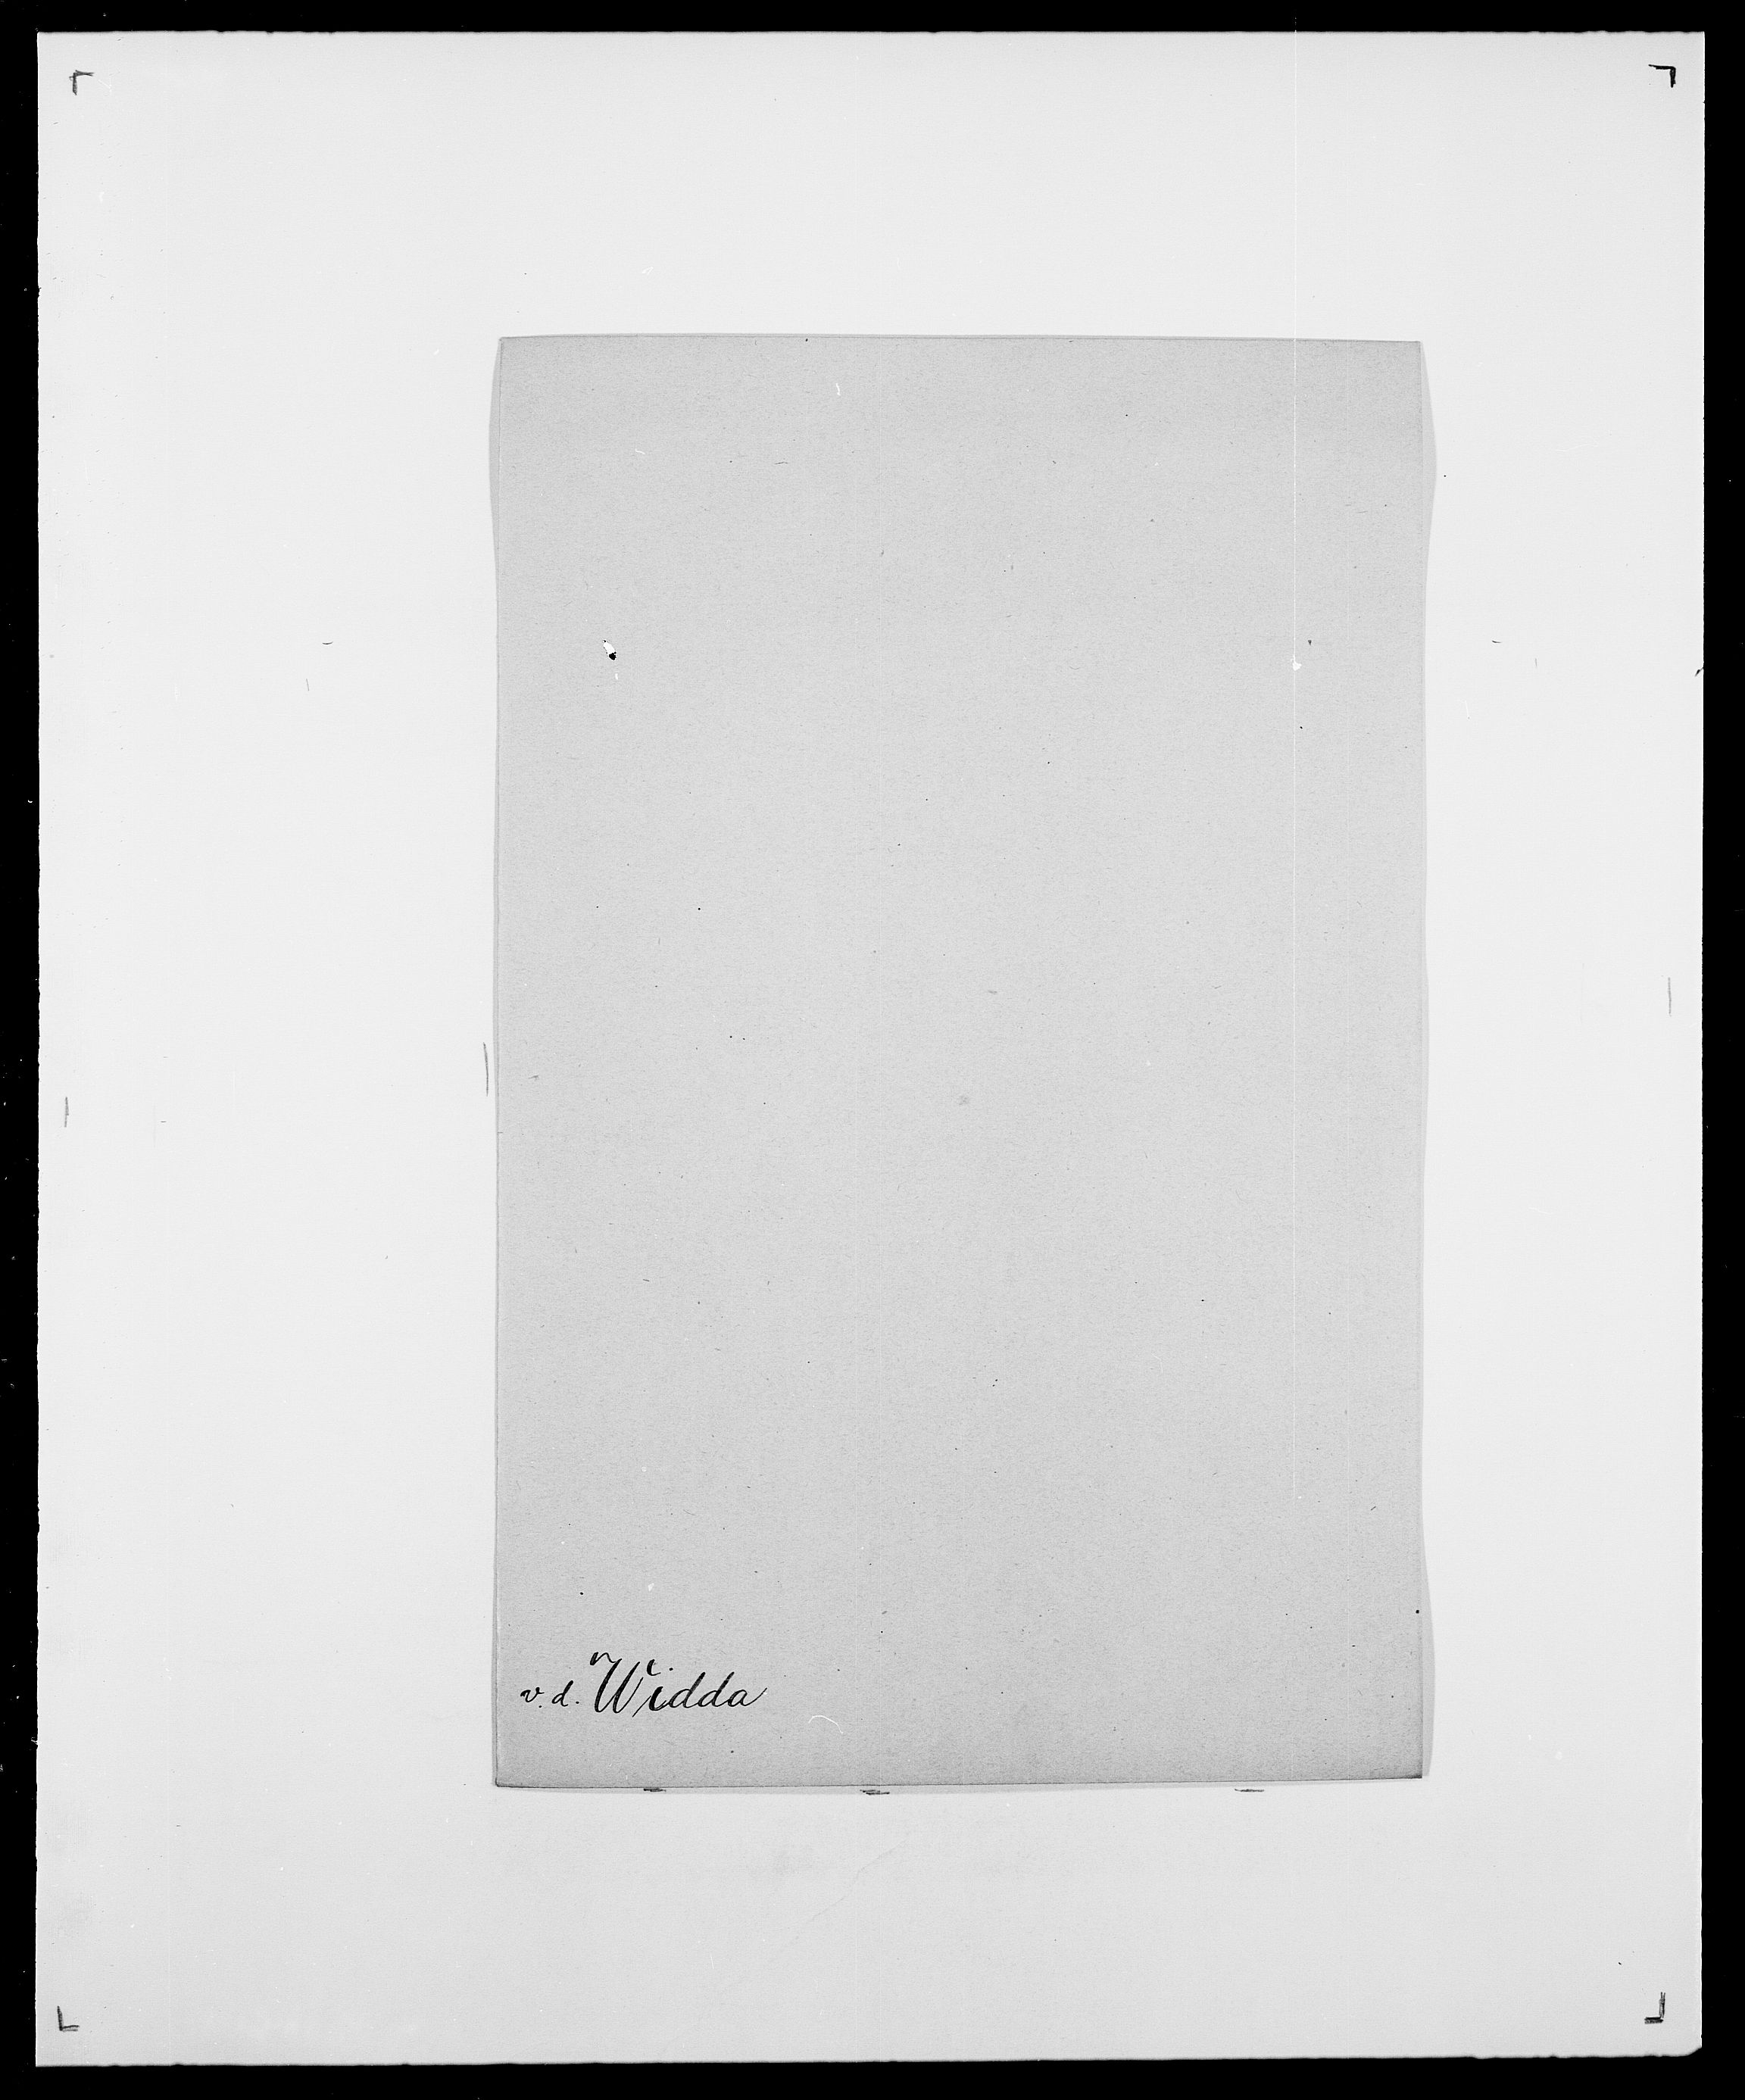 SAO, Delgobe, Charles Antoine - samling, D/Da/L0041: Vemmestad - Viker, s. 459